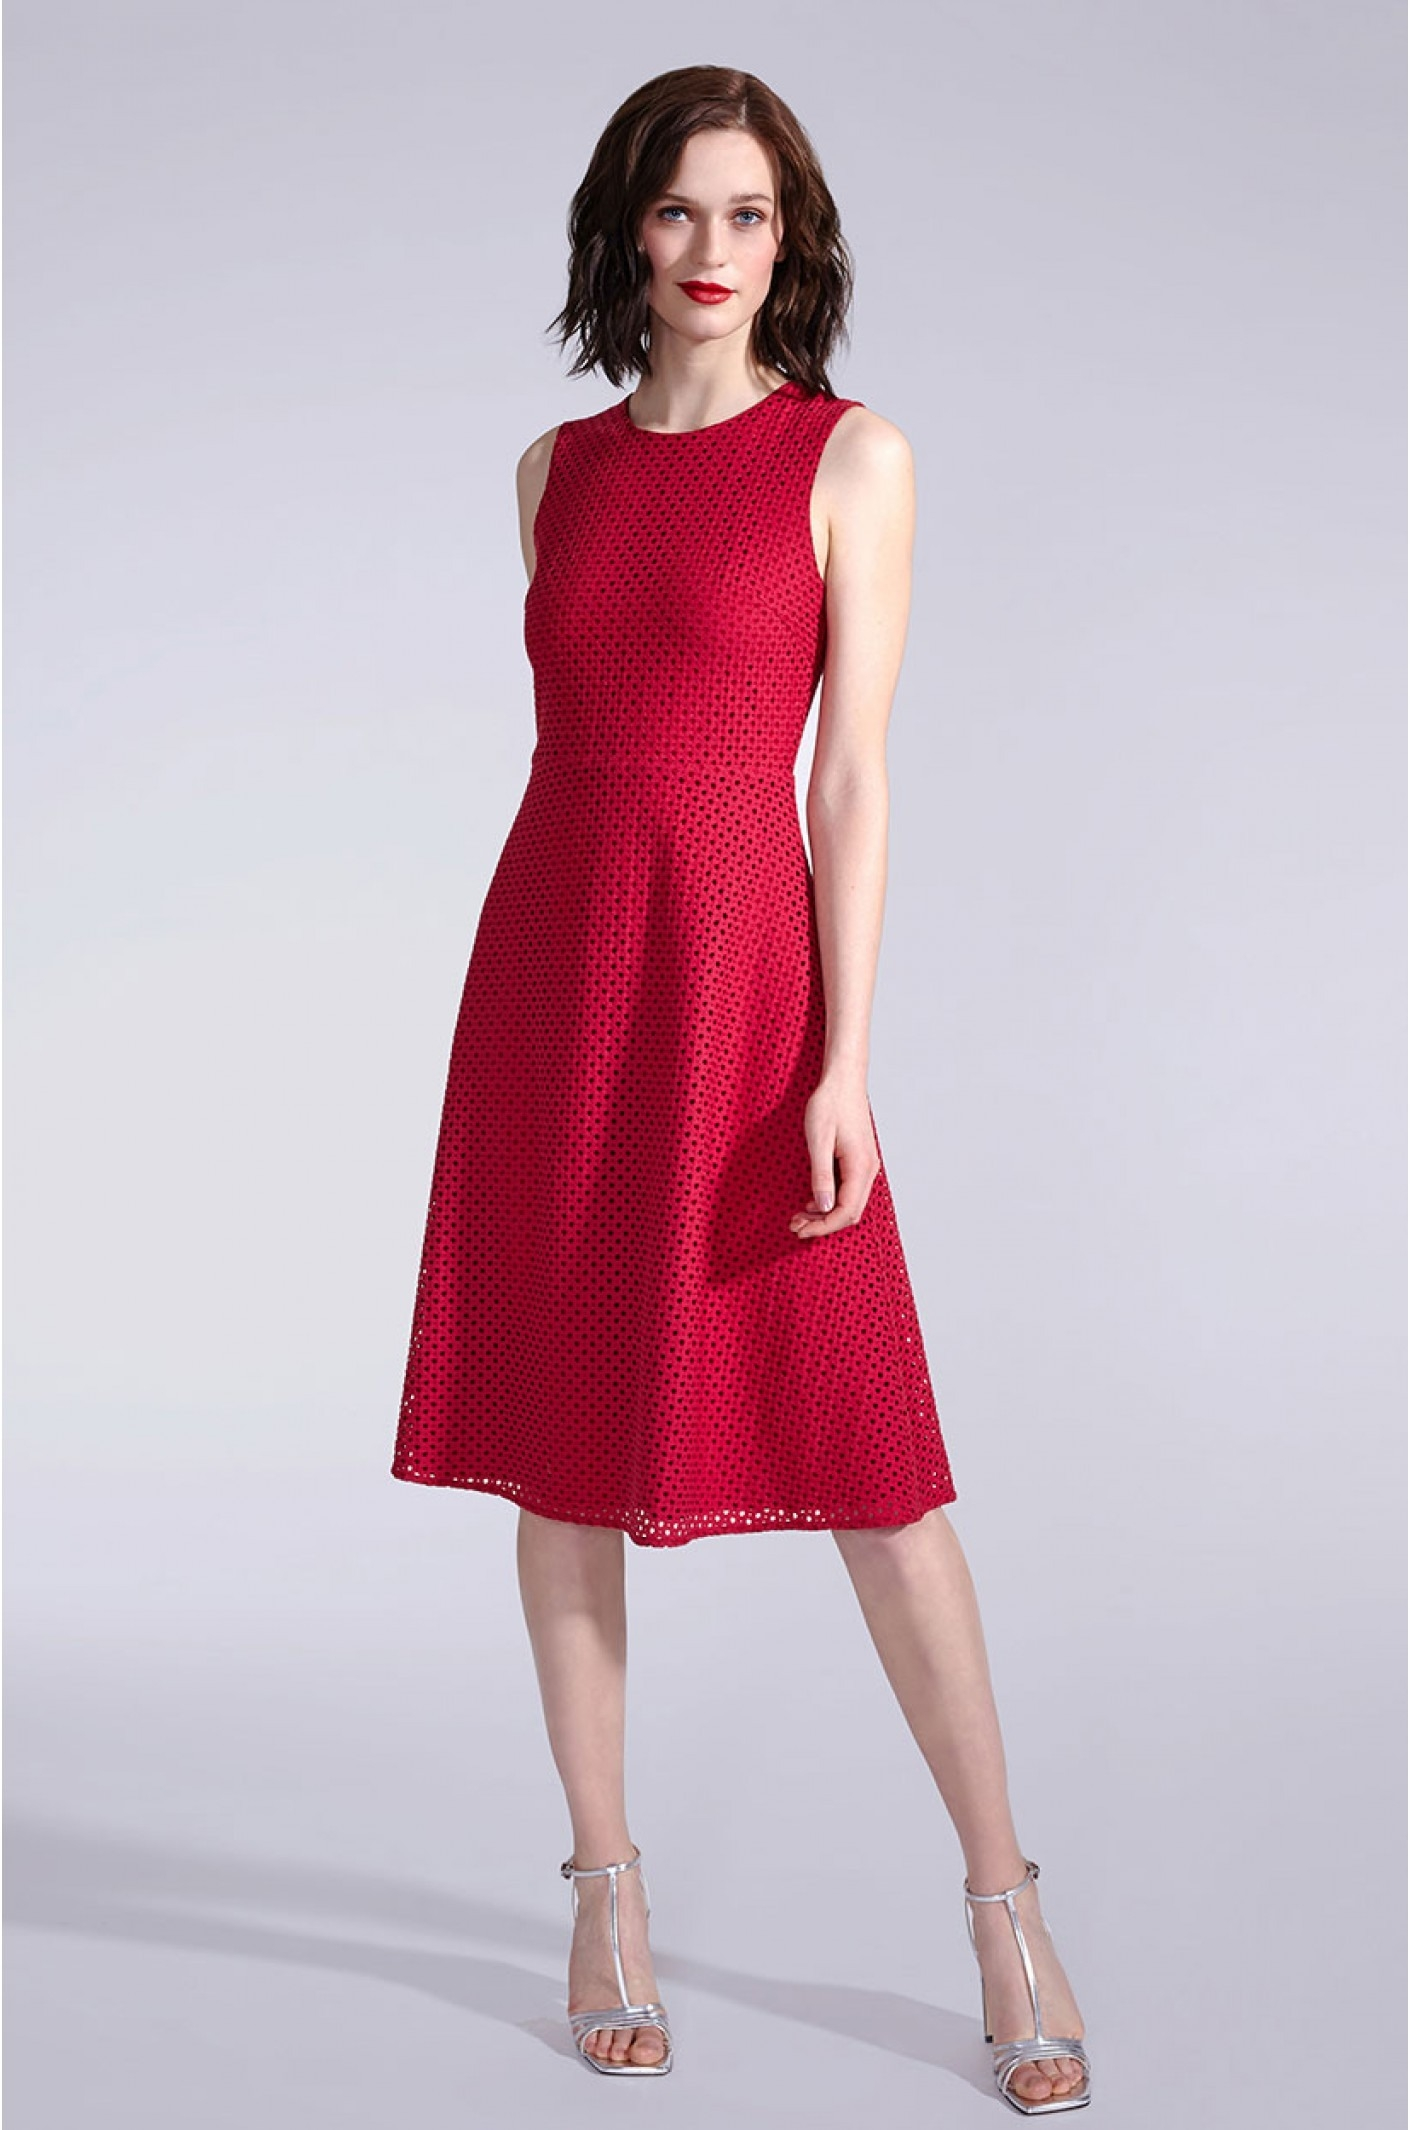 17 Top Elegante Kleider Wadenlang ÄrmelFormal Ausgezeichnet Elegante Kleider Wadenlang Bester Preis